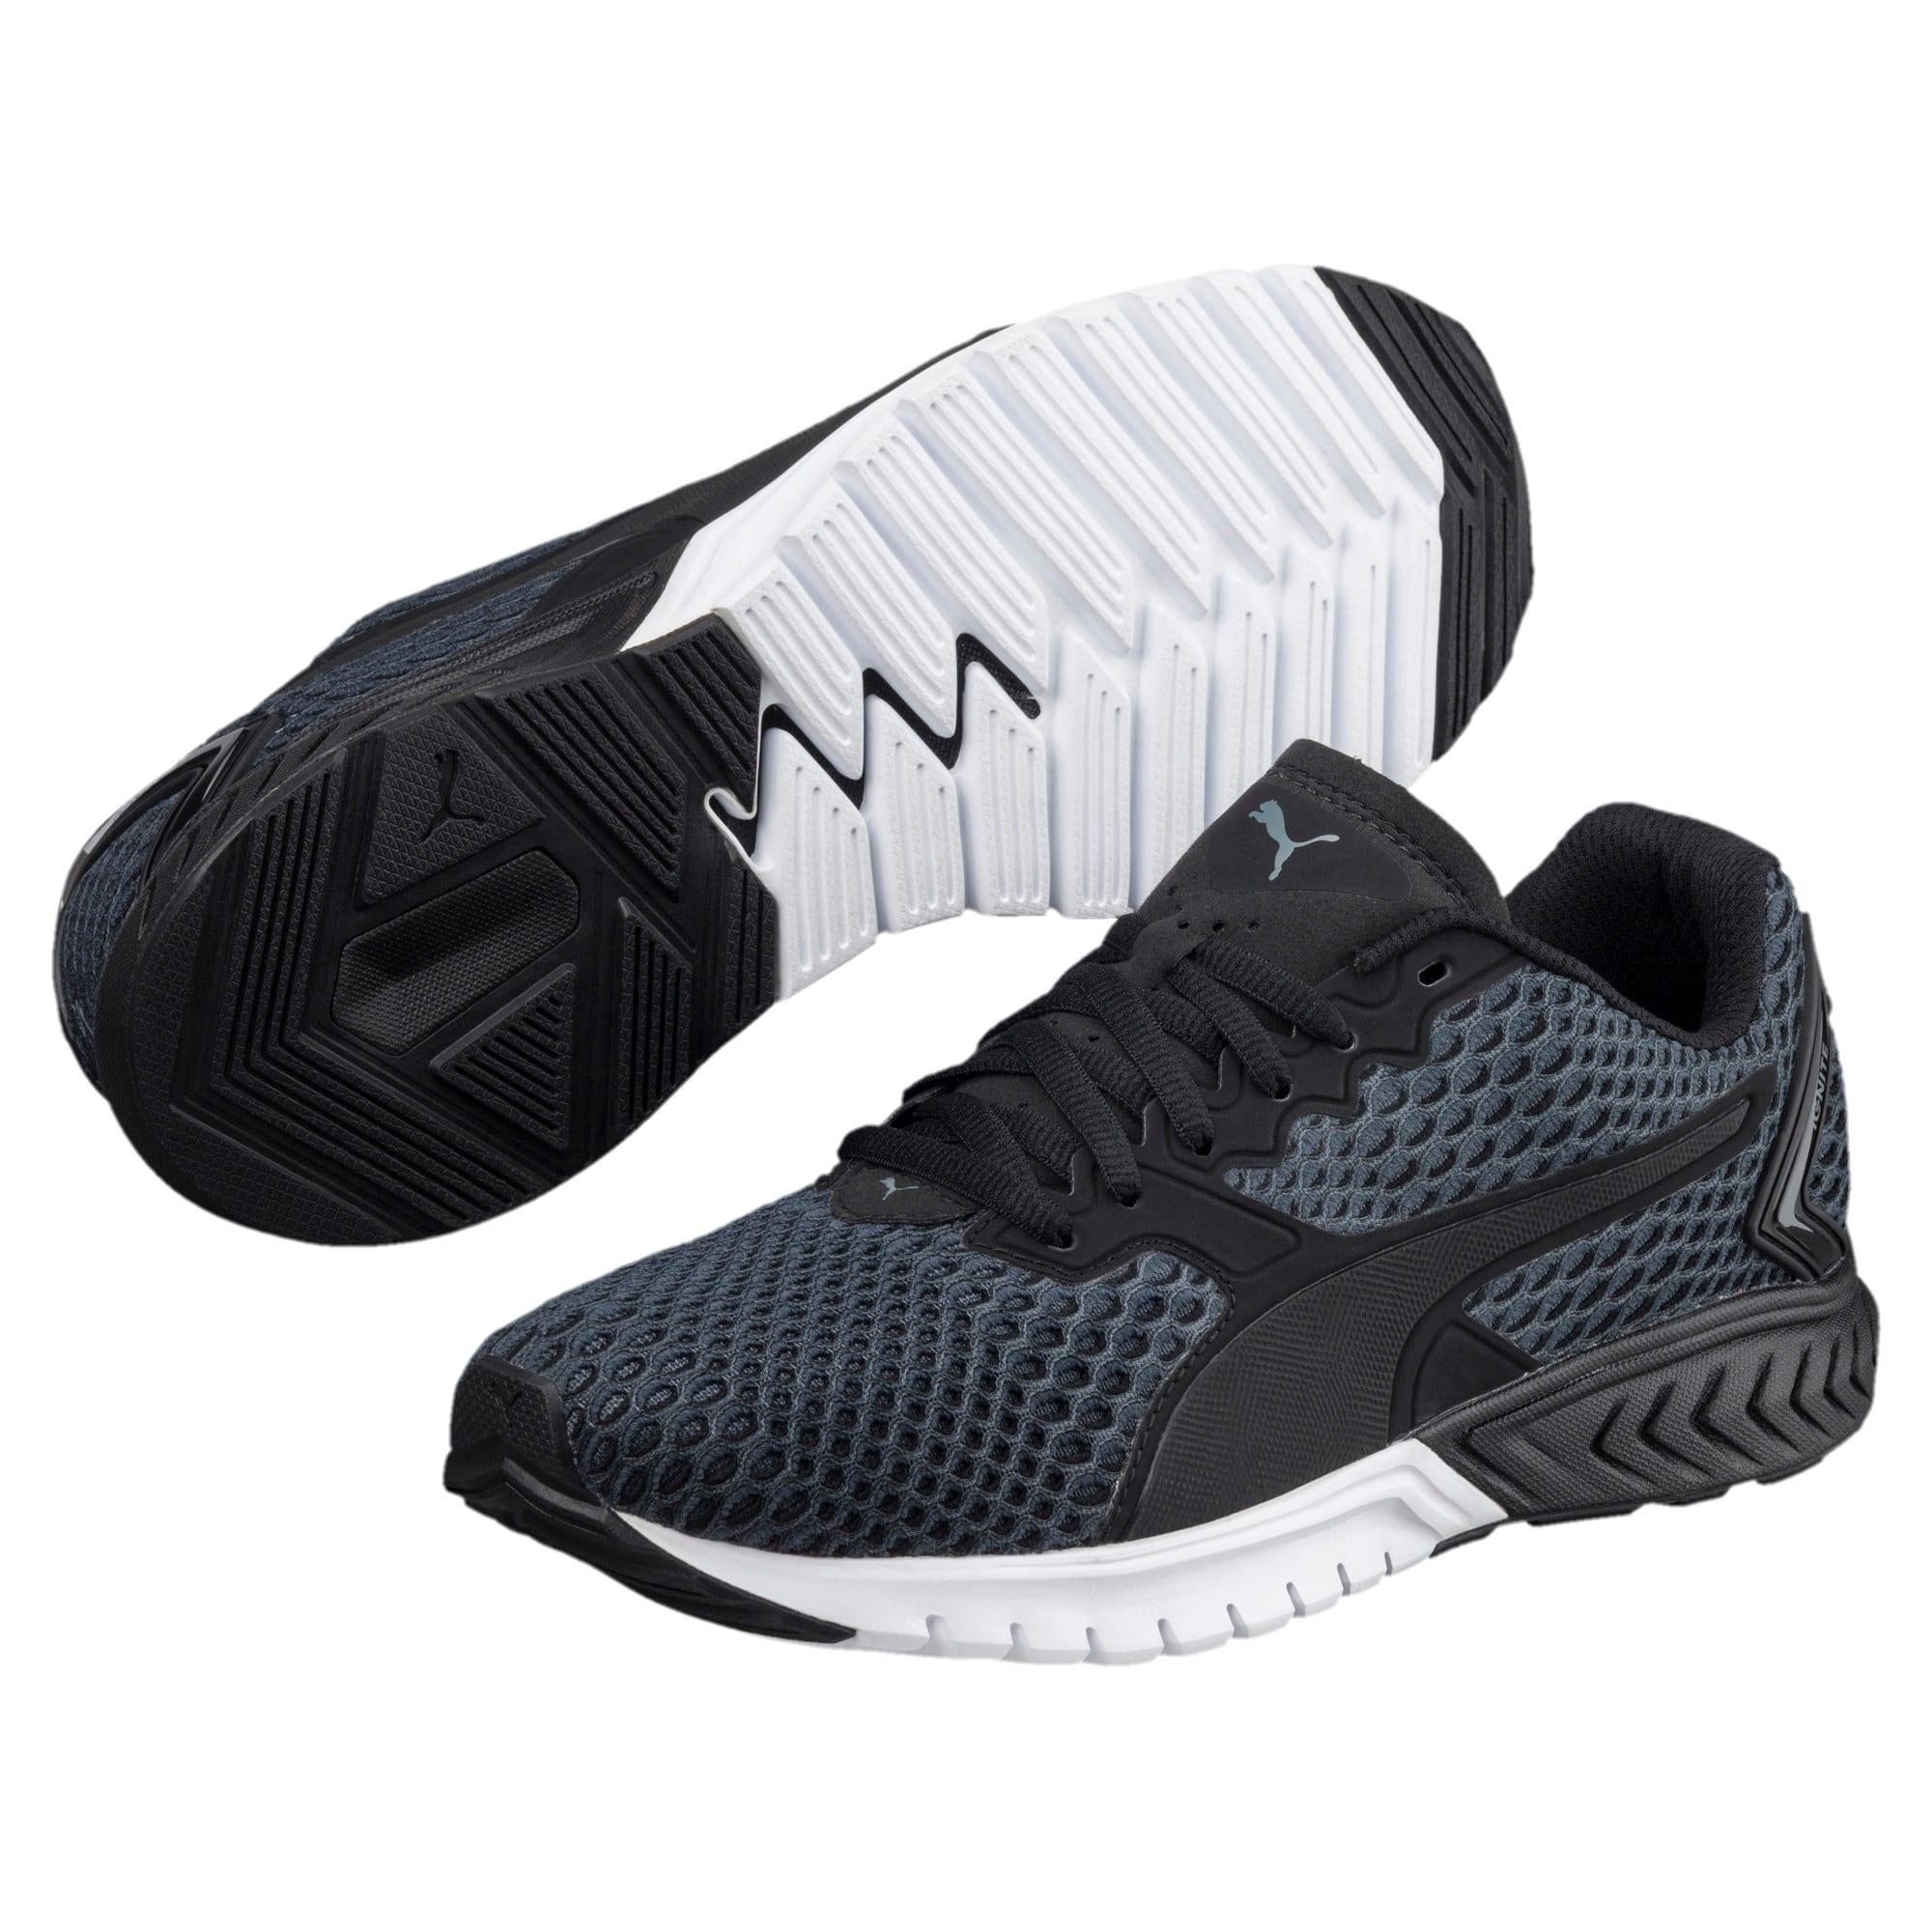 Thumbnail 2 of IGNITE Dual New Core Women's Training Shoes, Puma Black-Asphalt, medium-IND